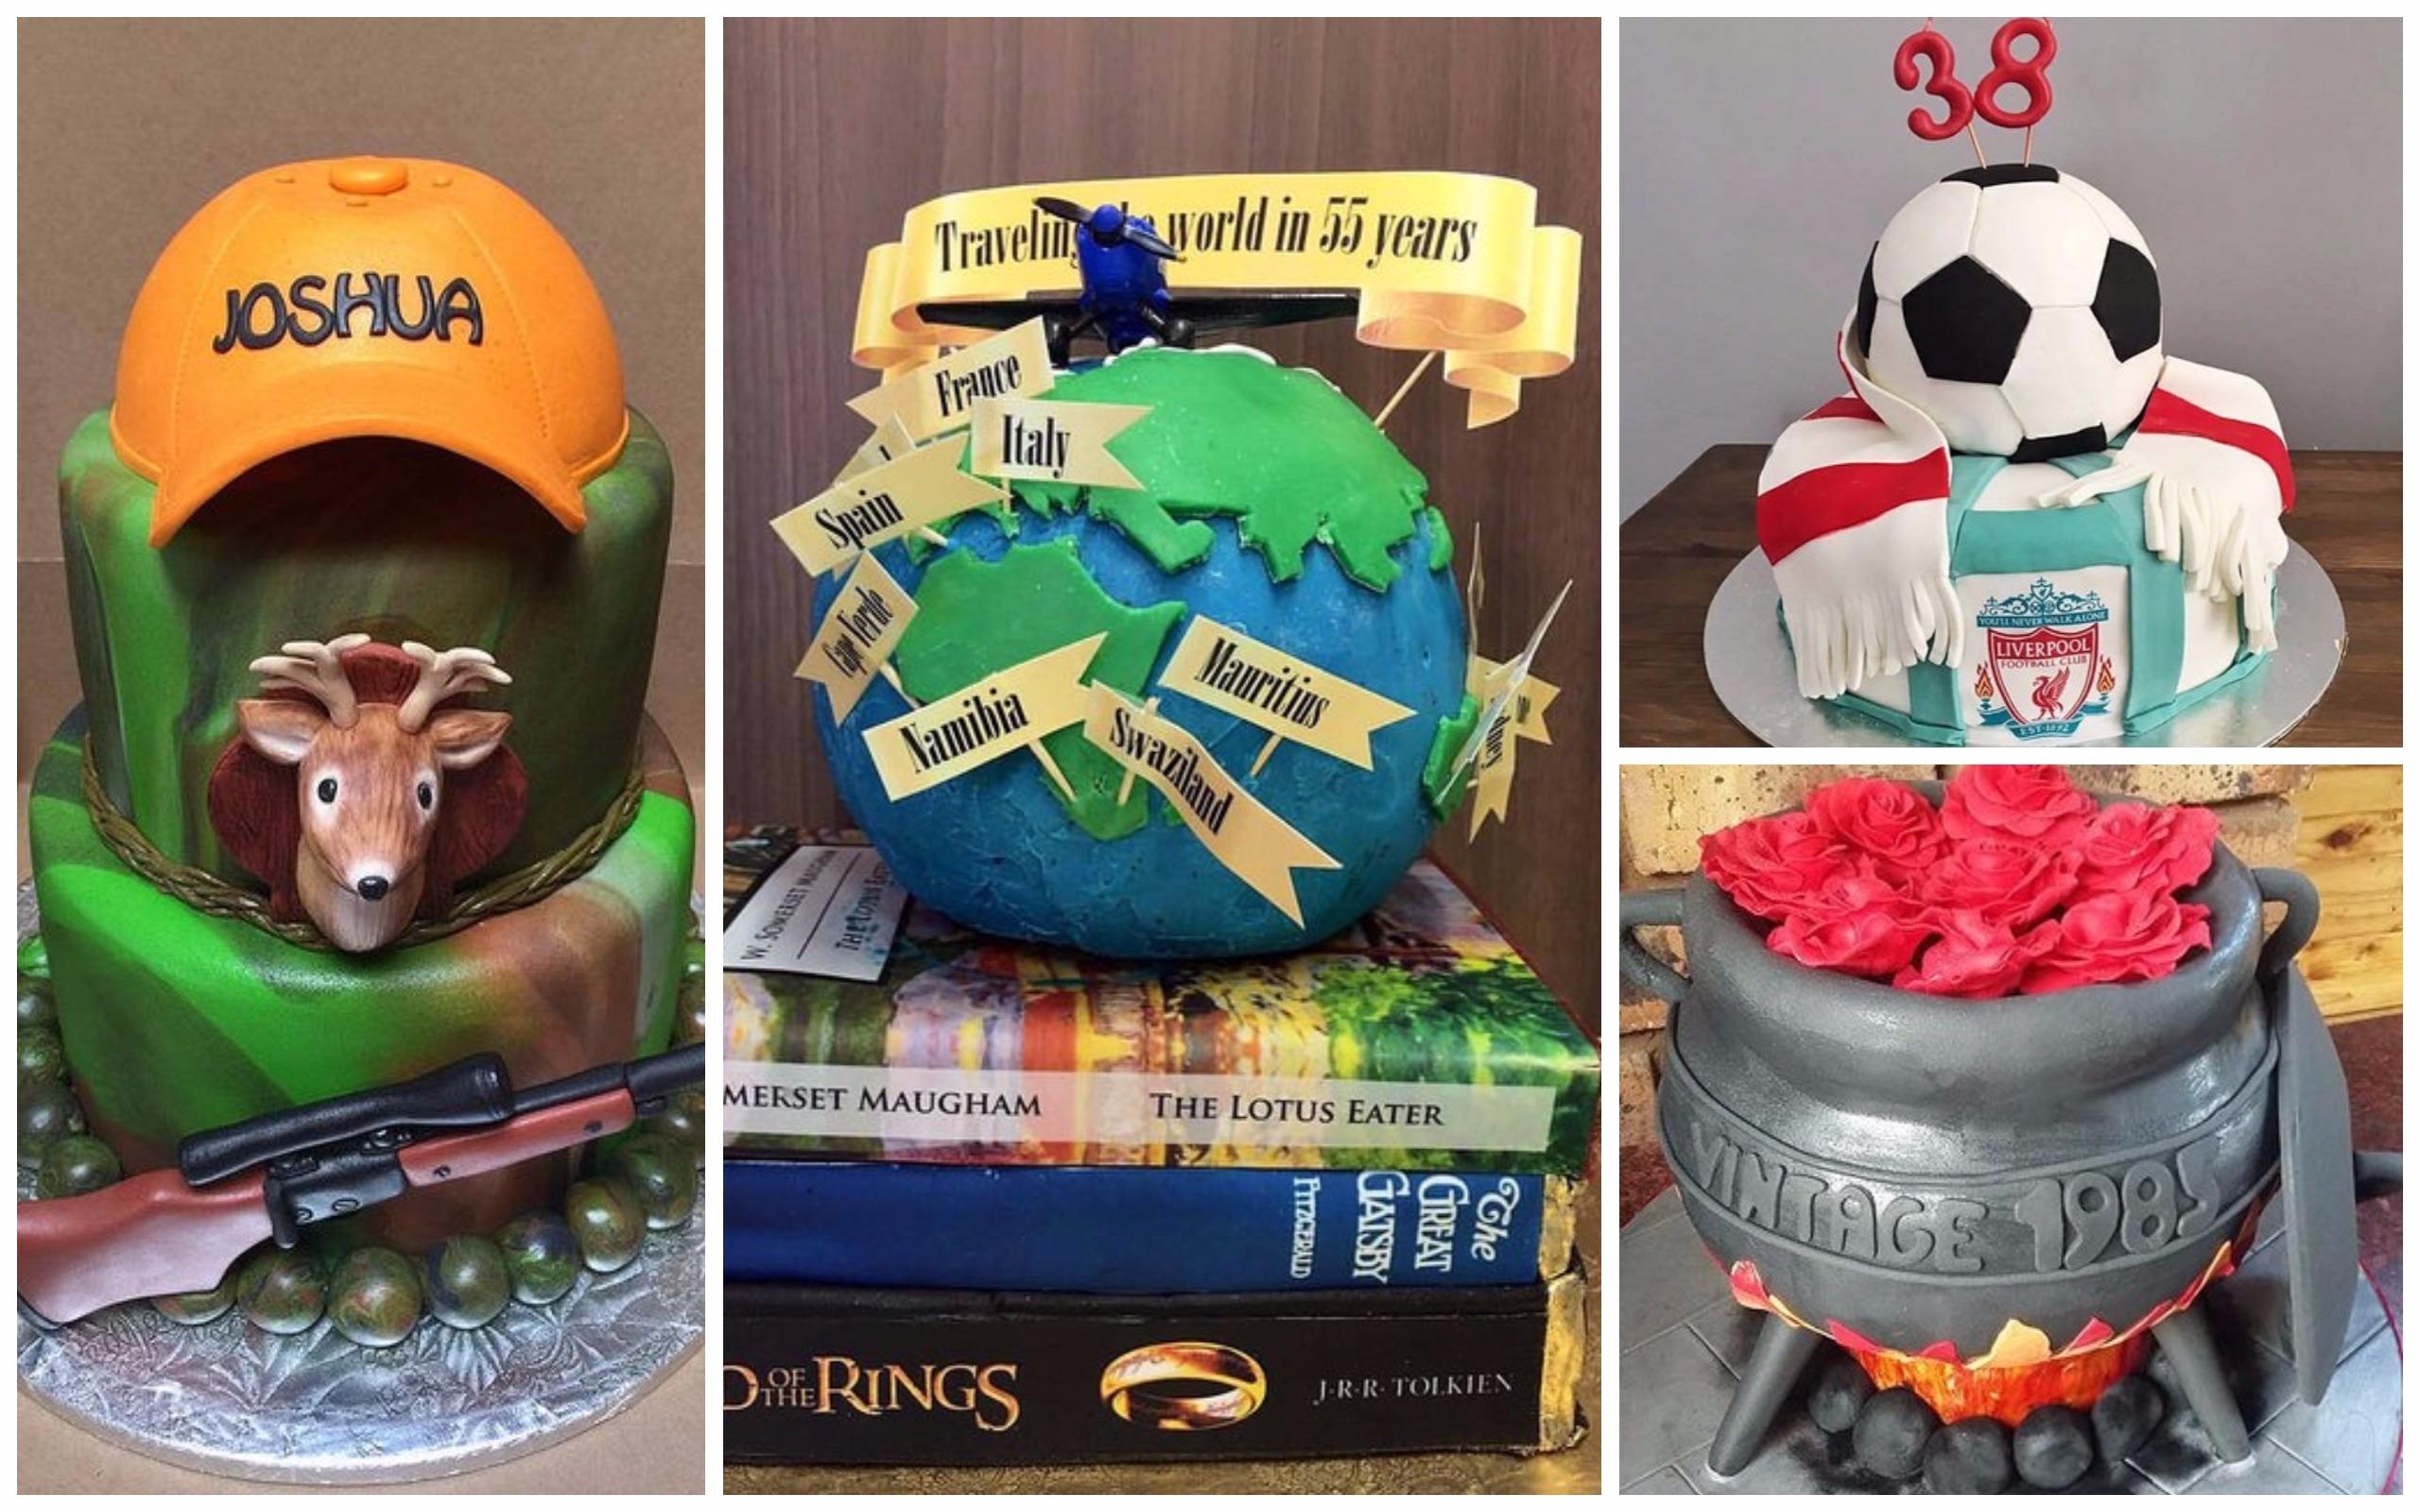 Competition Designer of the Worlds MindBoggling Cake